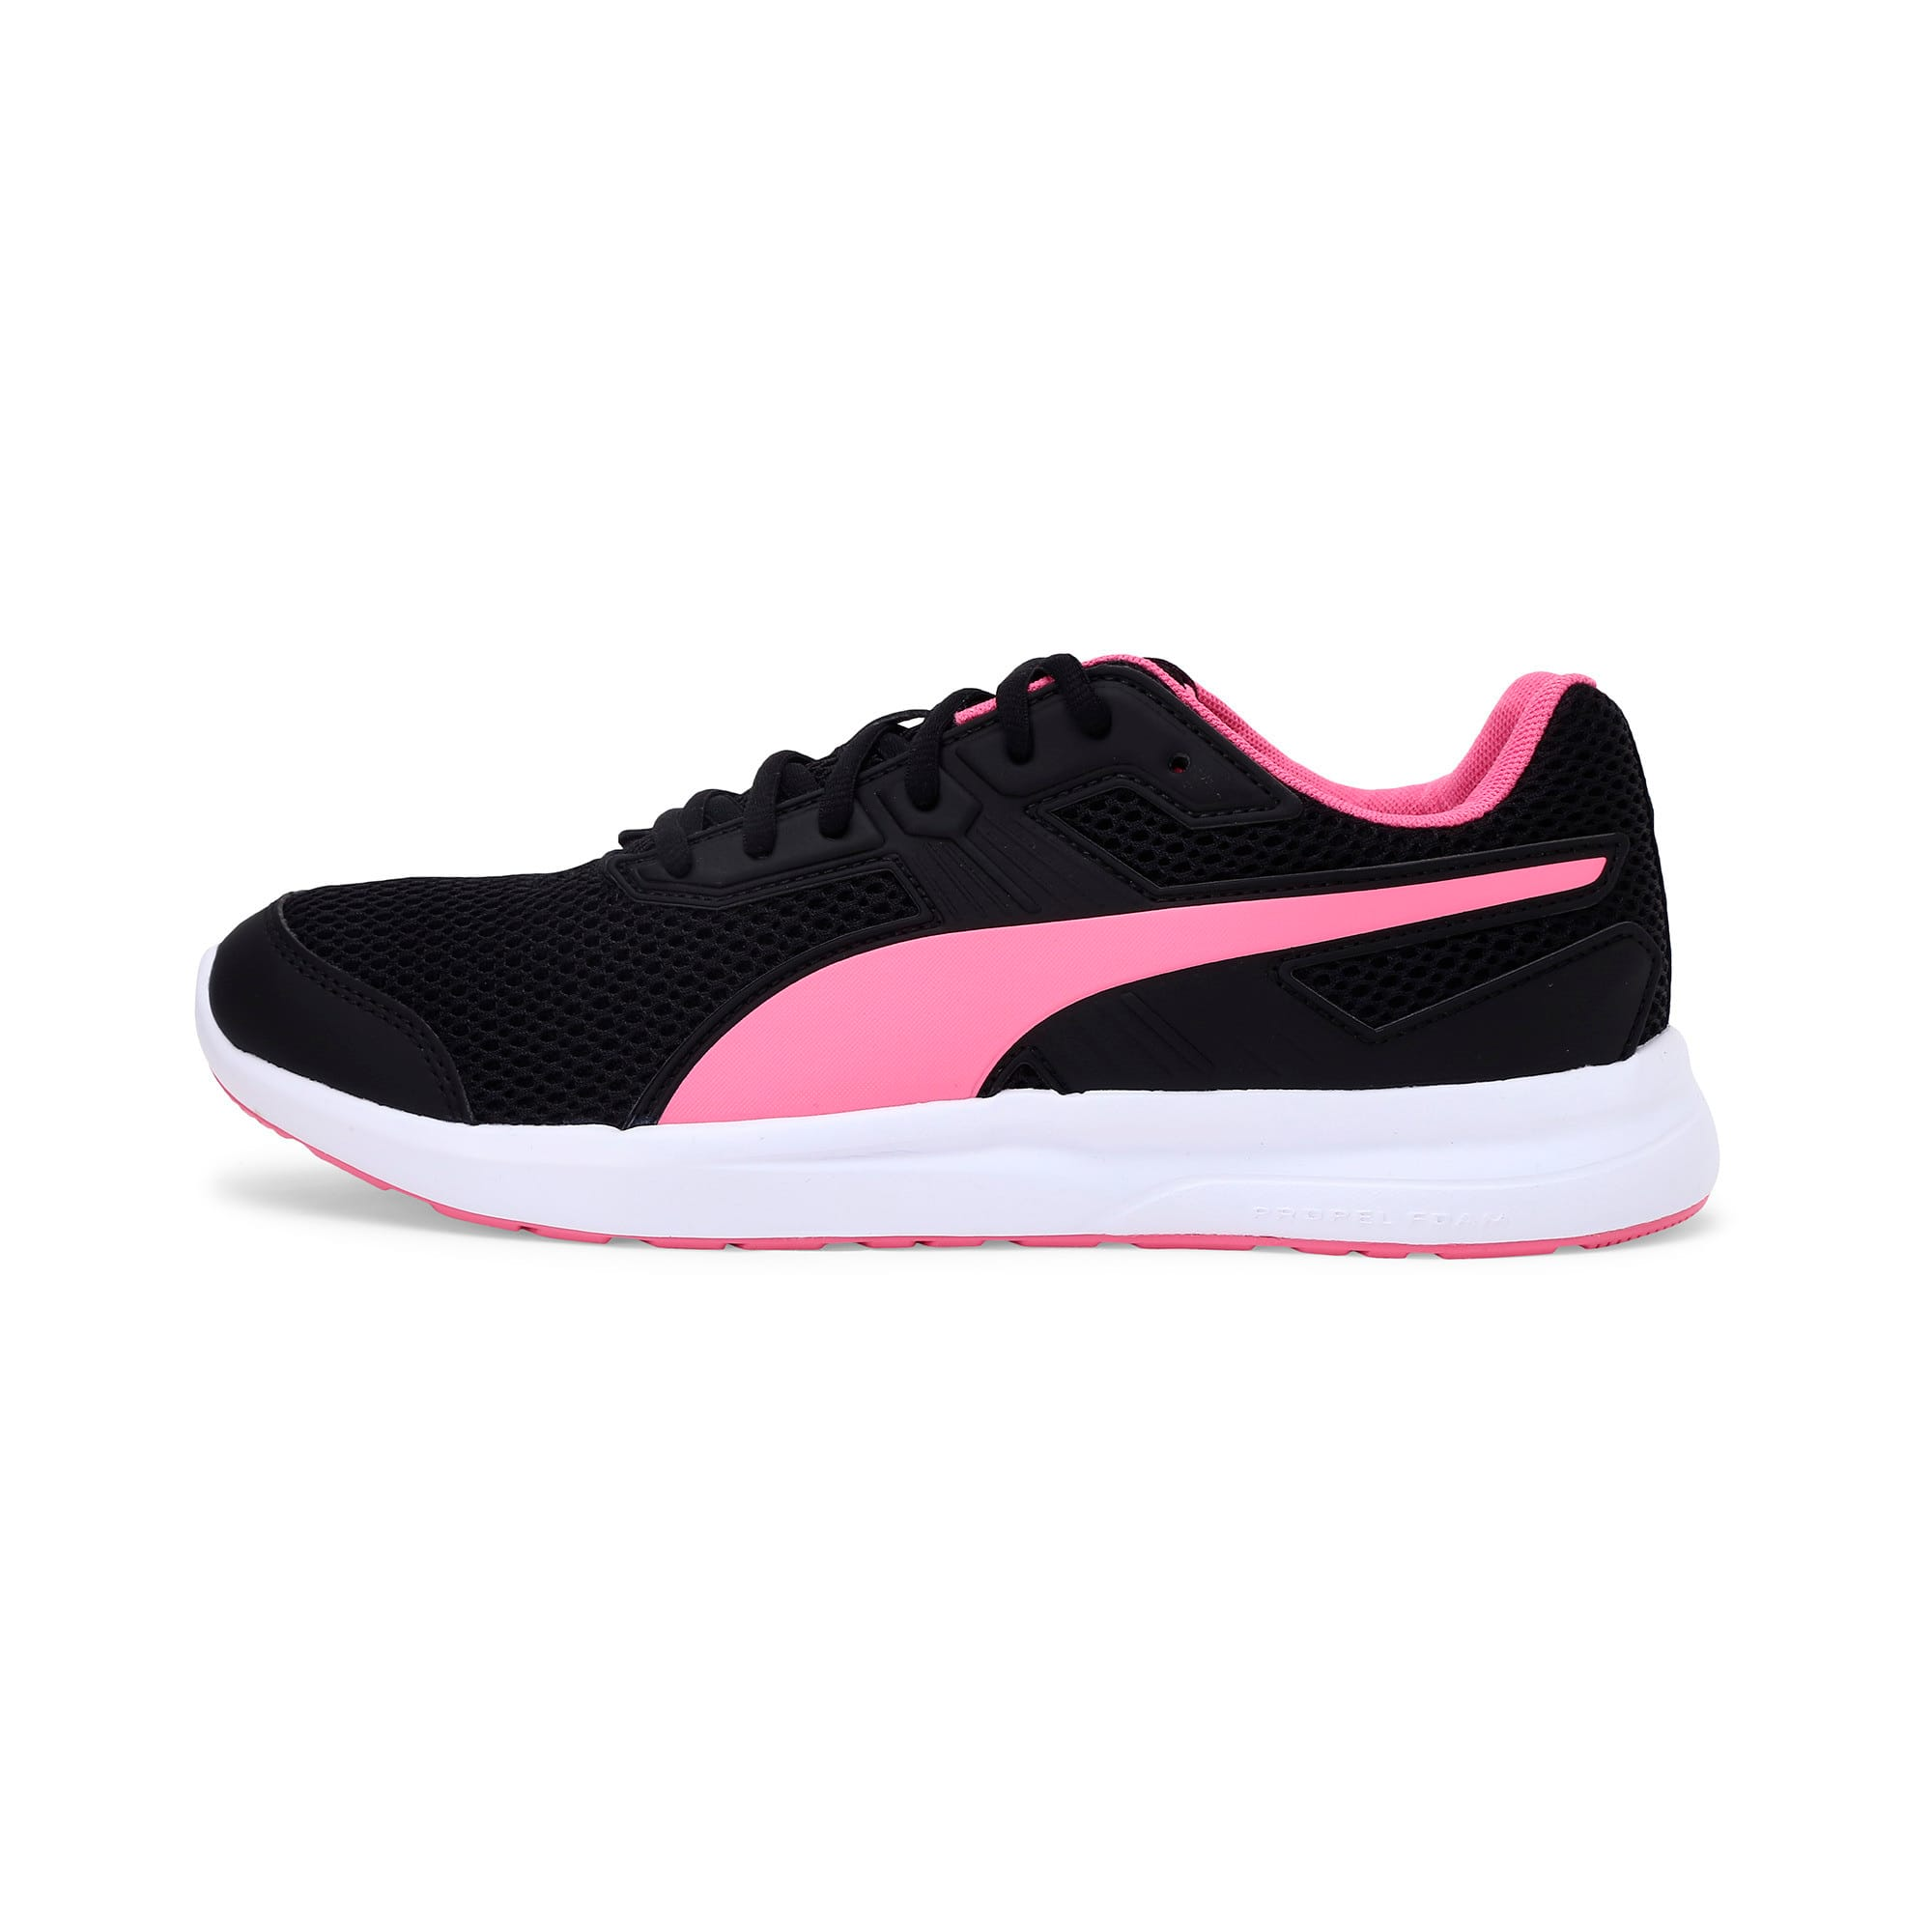 Thumbnail 1 of Escaper Training Shoes, Puma Black-Azalea Pink-White, medium-IND